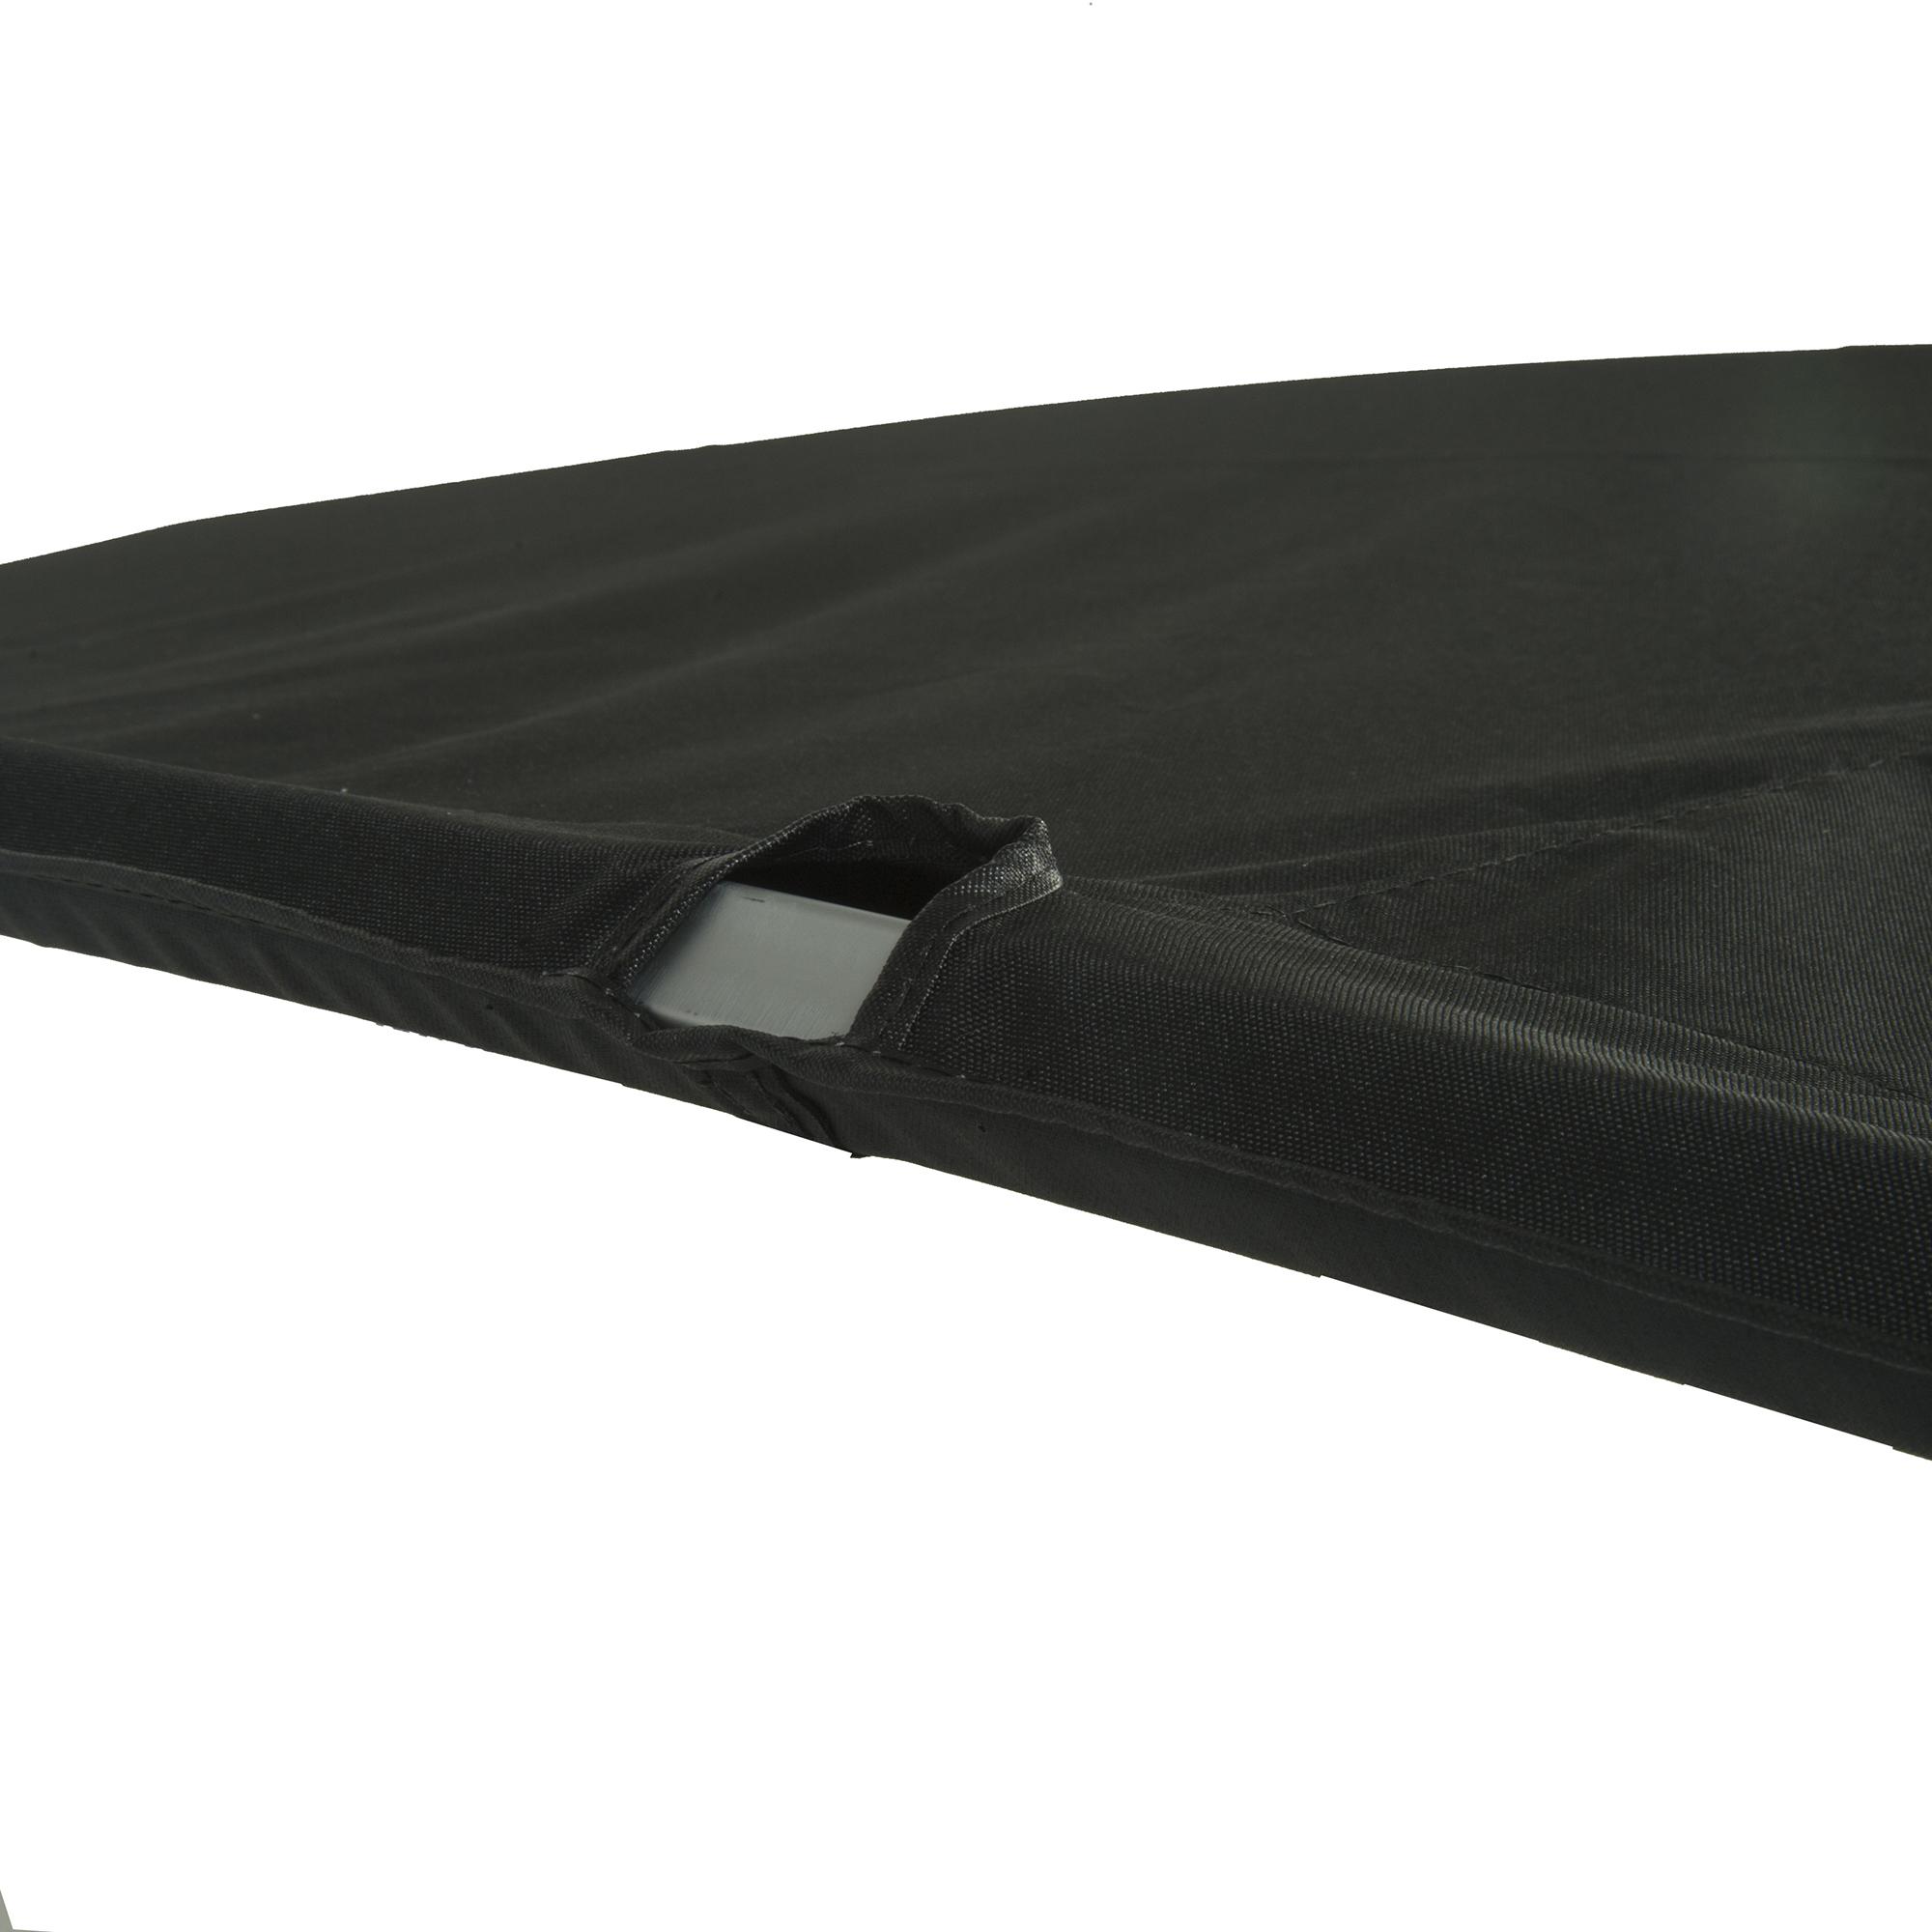 "Traditional Pontoon Bimini Top, SurLast Polyester, 1-1/4"" Free Standing 90""-96""W"